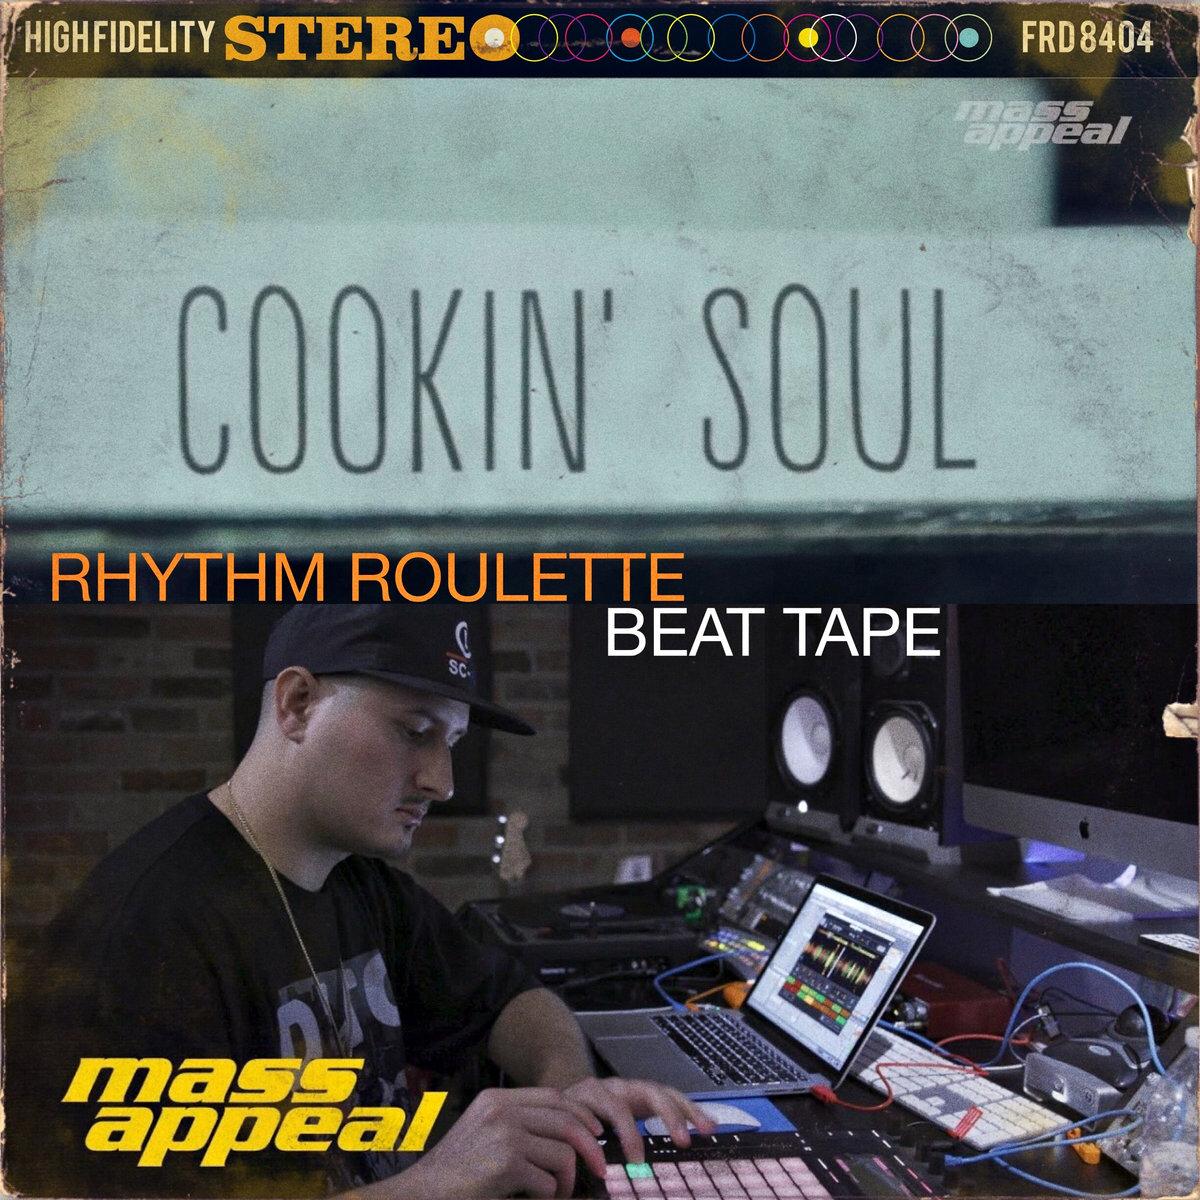 Rhythm_roulette_beat_tape